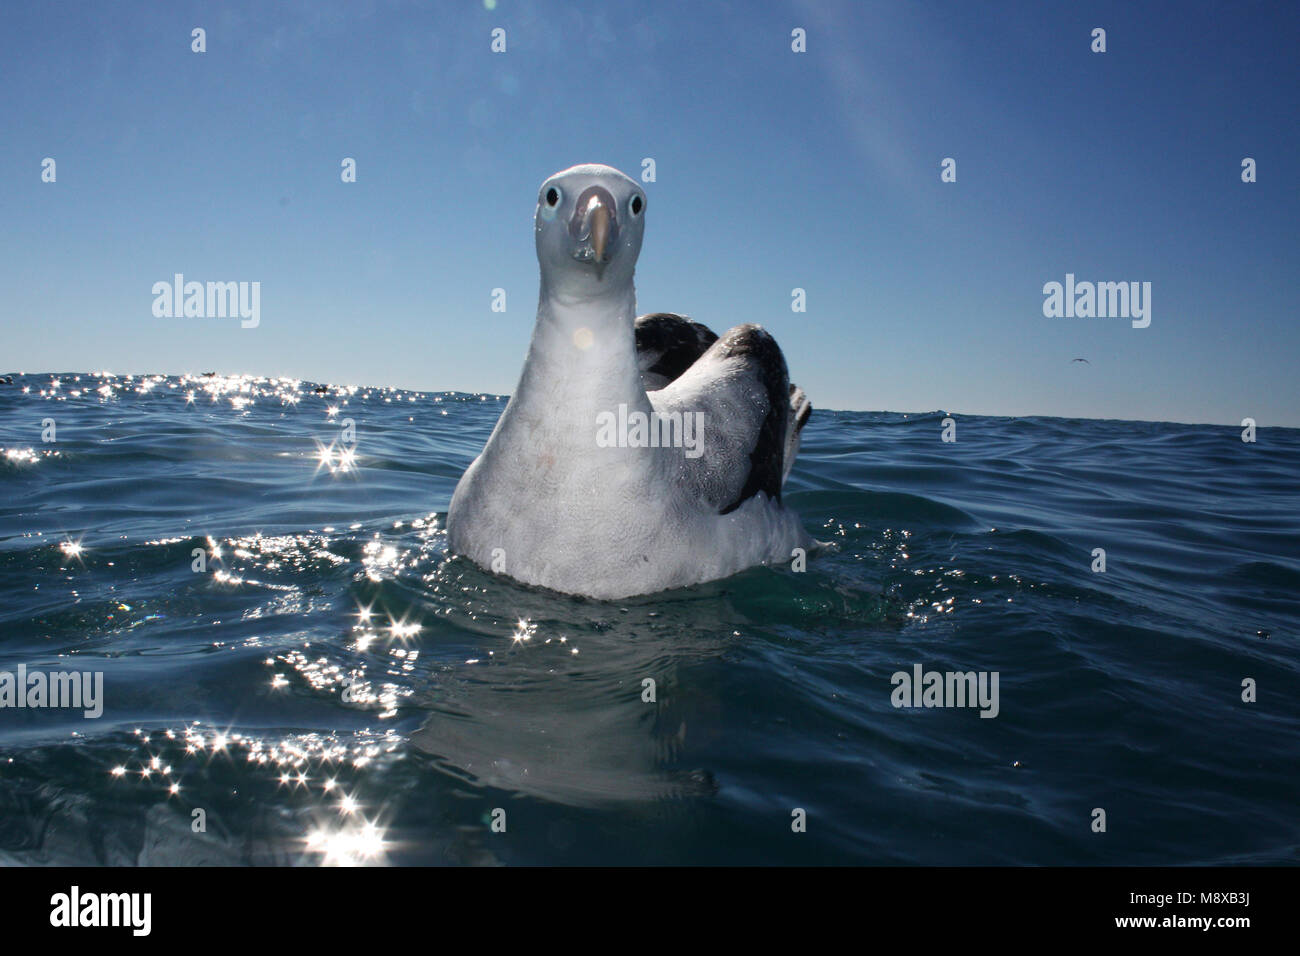 Zwemmende Grote Albatros; Swimming Wandering Albatross - Stock Image